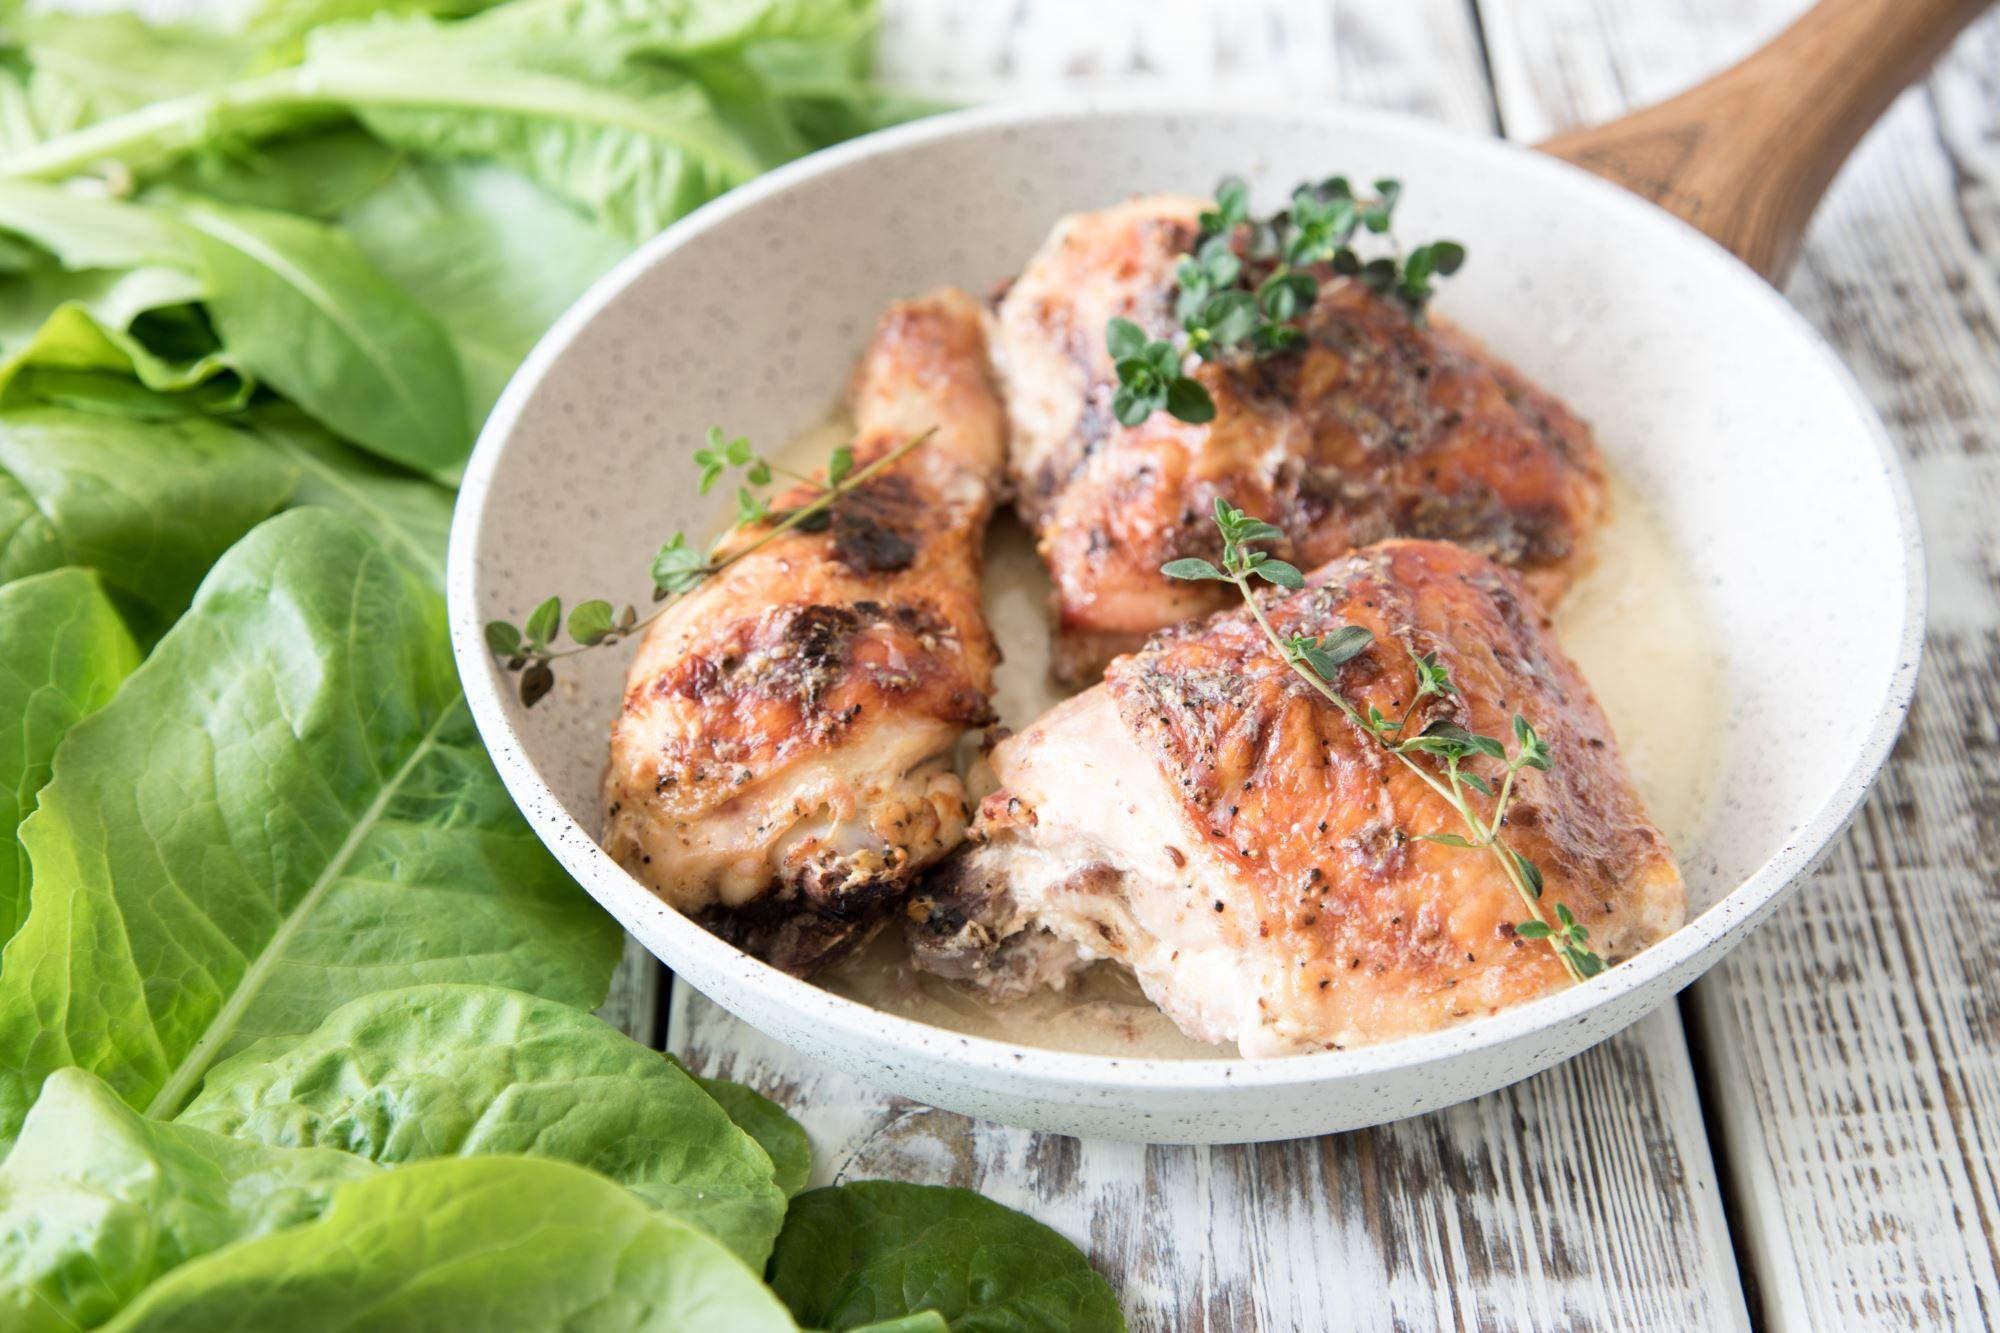 Braiseret kylling med selleri og hvidløg